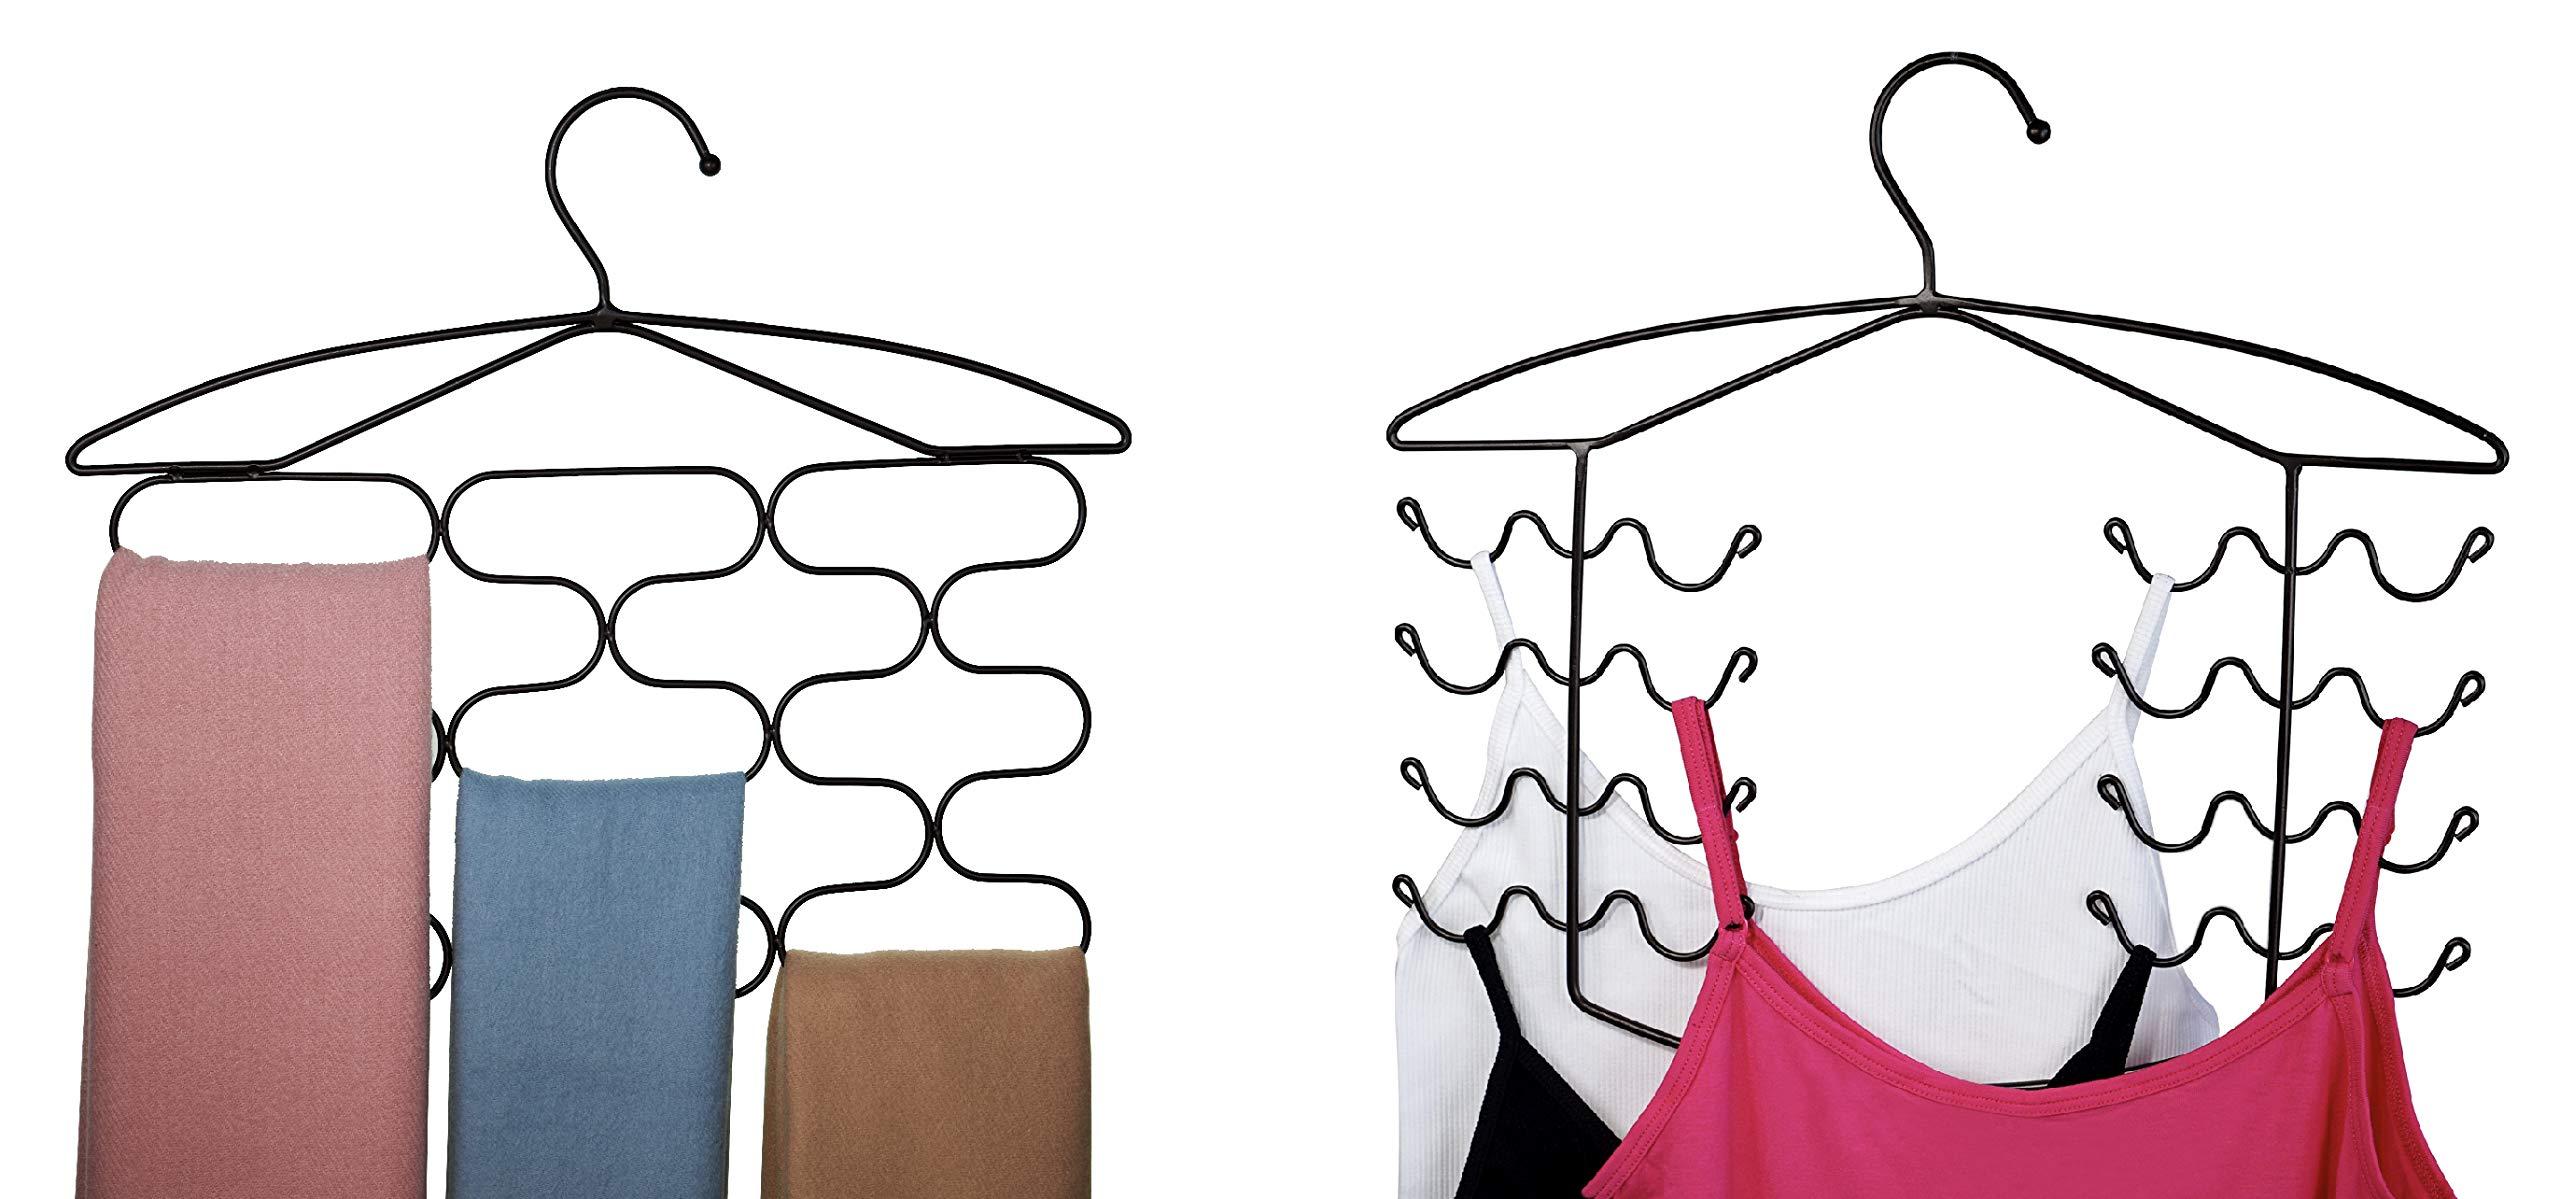 CAXXA Combo Pack Bra Camisole Dress Tank Top Hanger + 13 Sections Scarf Tie Belt Holder   Closet Bedroom Mudroom Organizer Storage Holder, Bronze by CAXXA